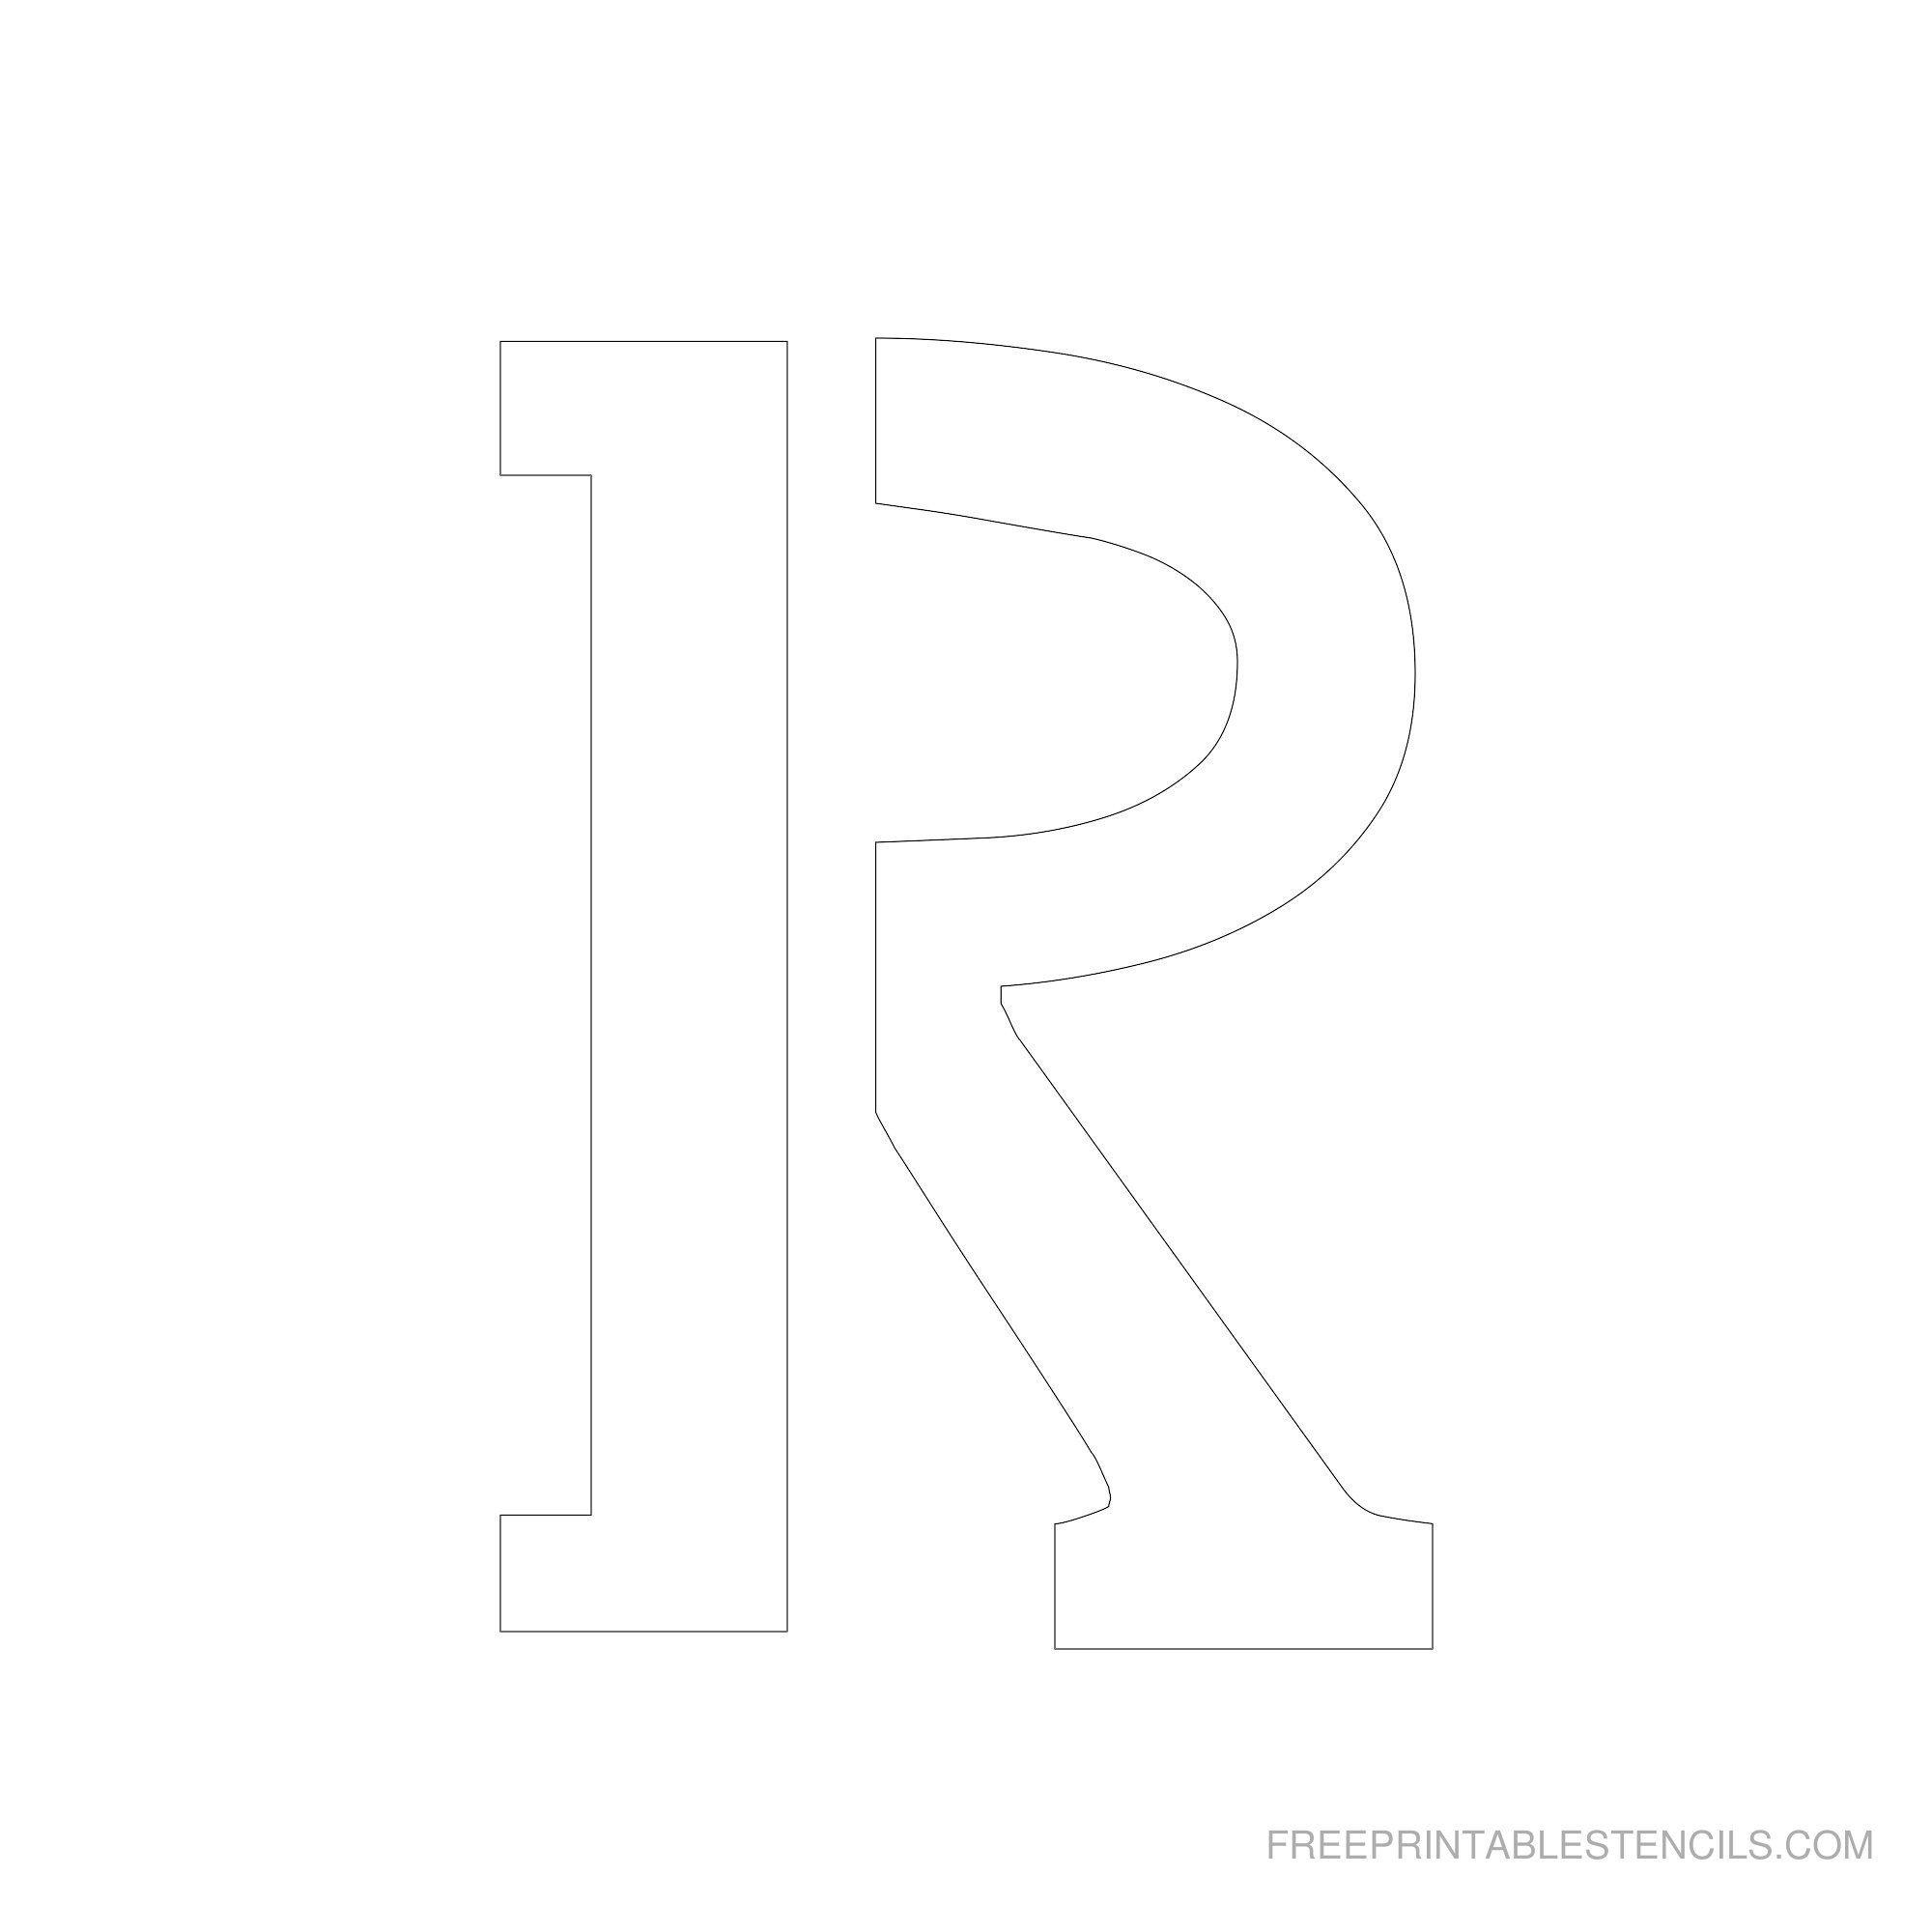 Free Printable Letter Stencils   Free Printable 6 Inch Alphabet - Free Printable Letter Stencils